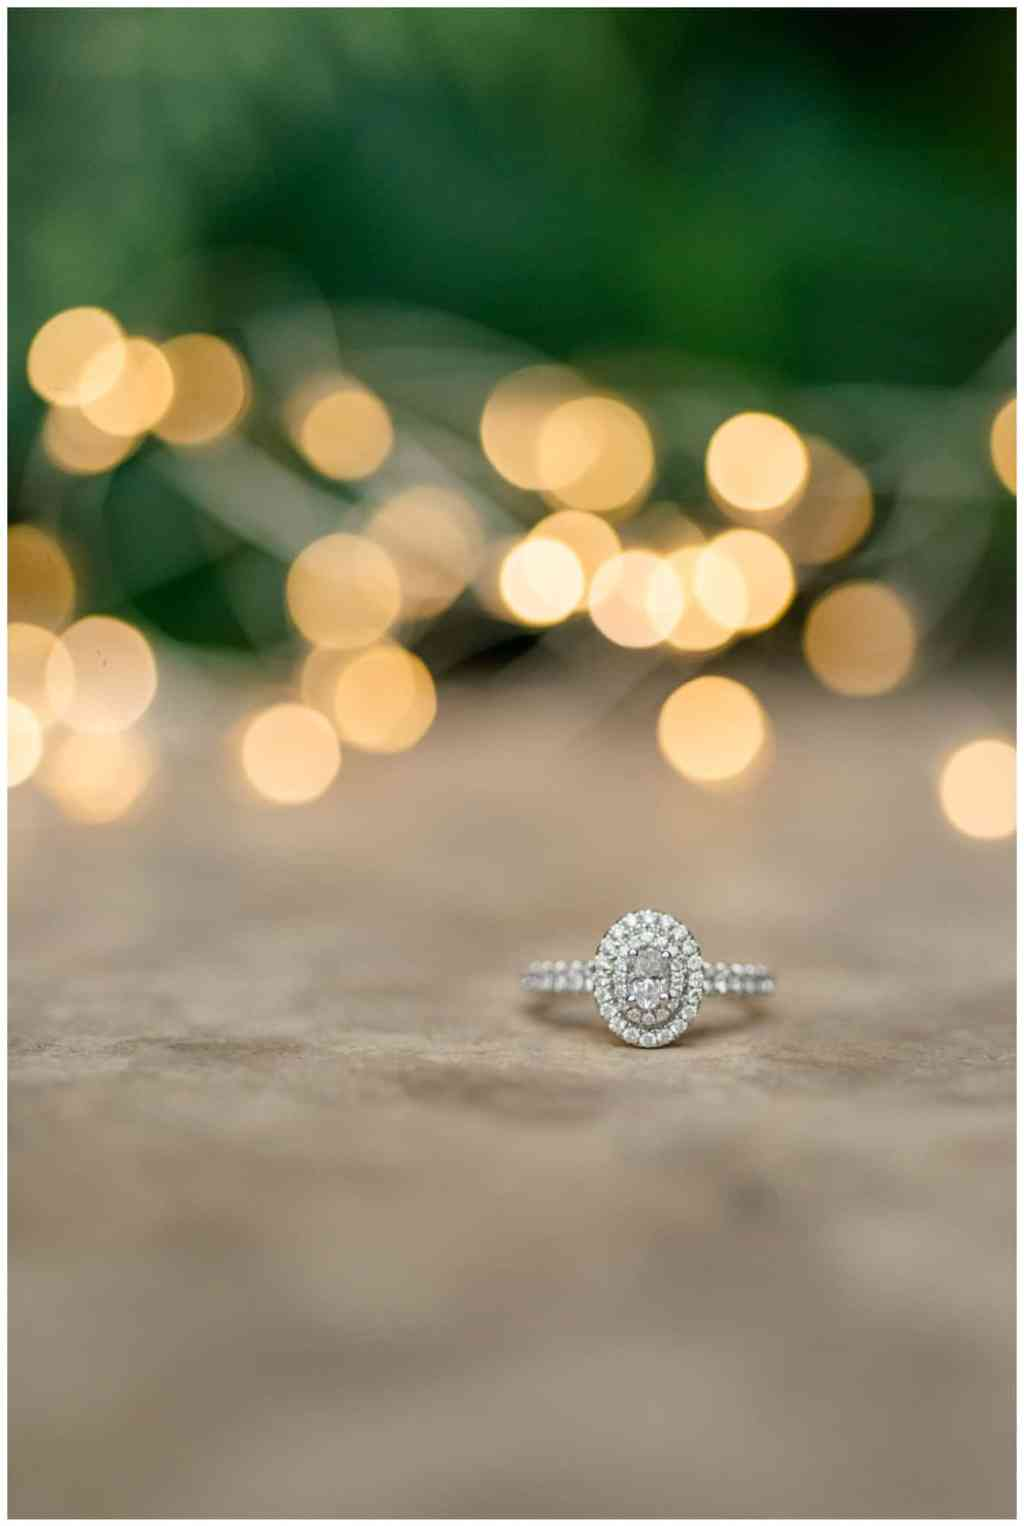 Regina Engagement Photography - Regina Wedding Photography - Mitch-Latasha - Winter Engagement - TC Douglas Building - MacKenzie Art Gallery - Ring